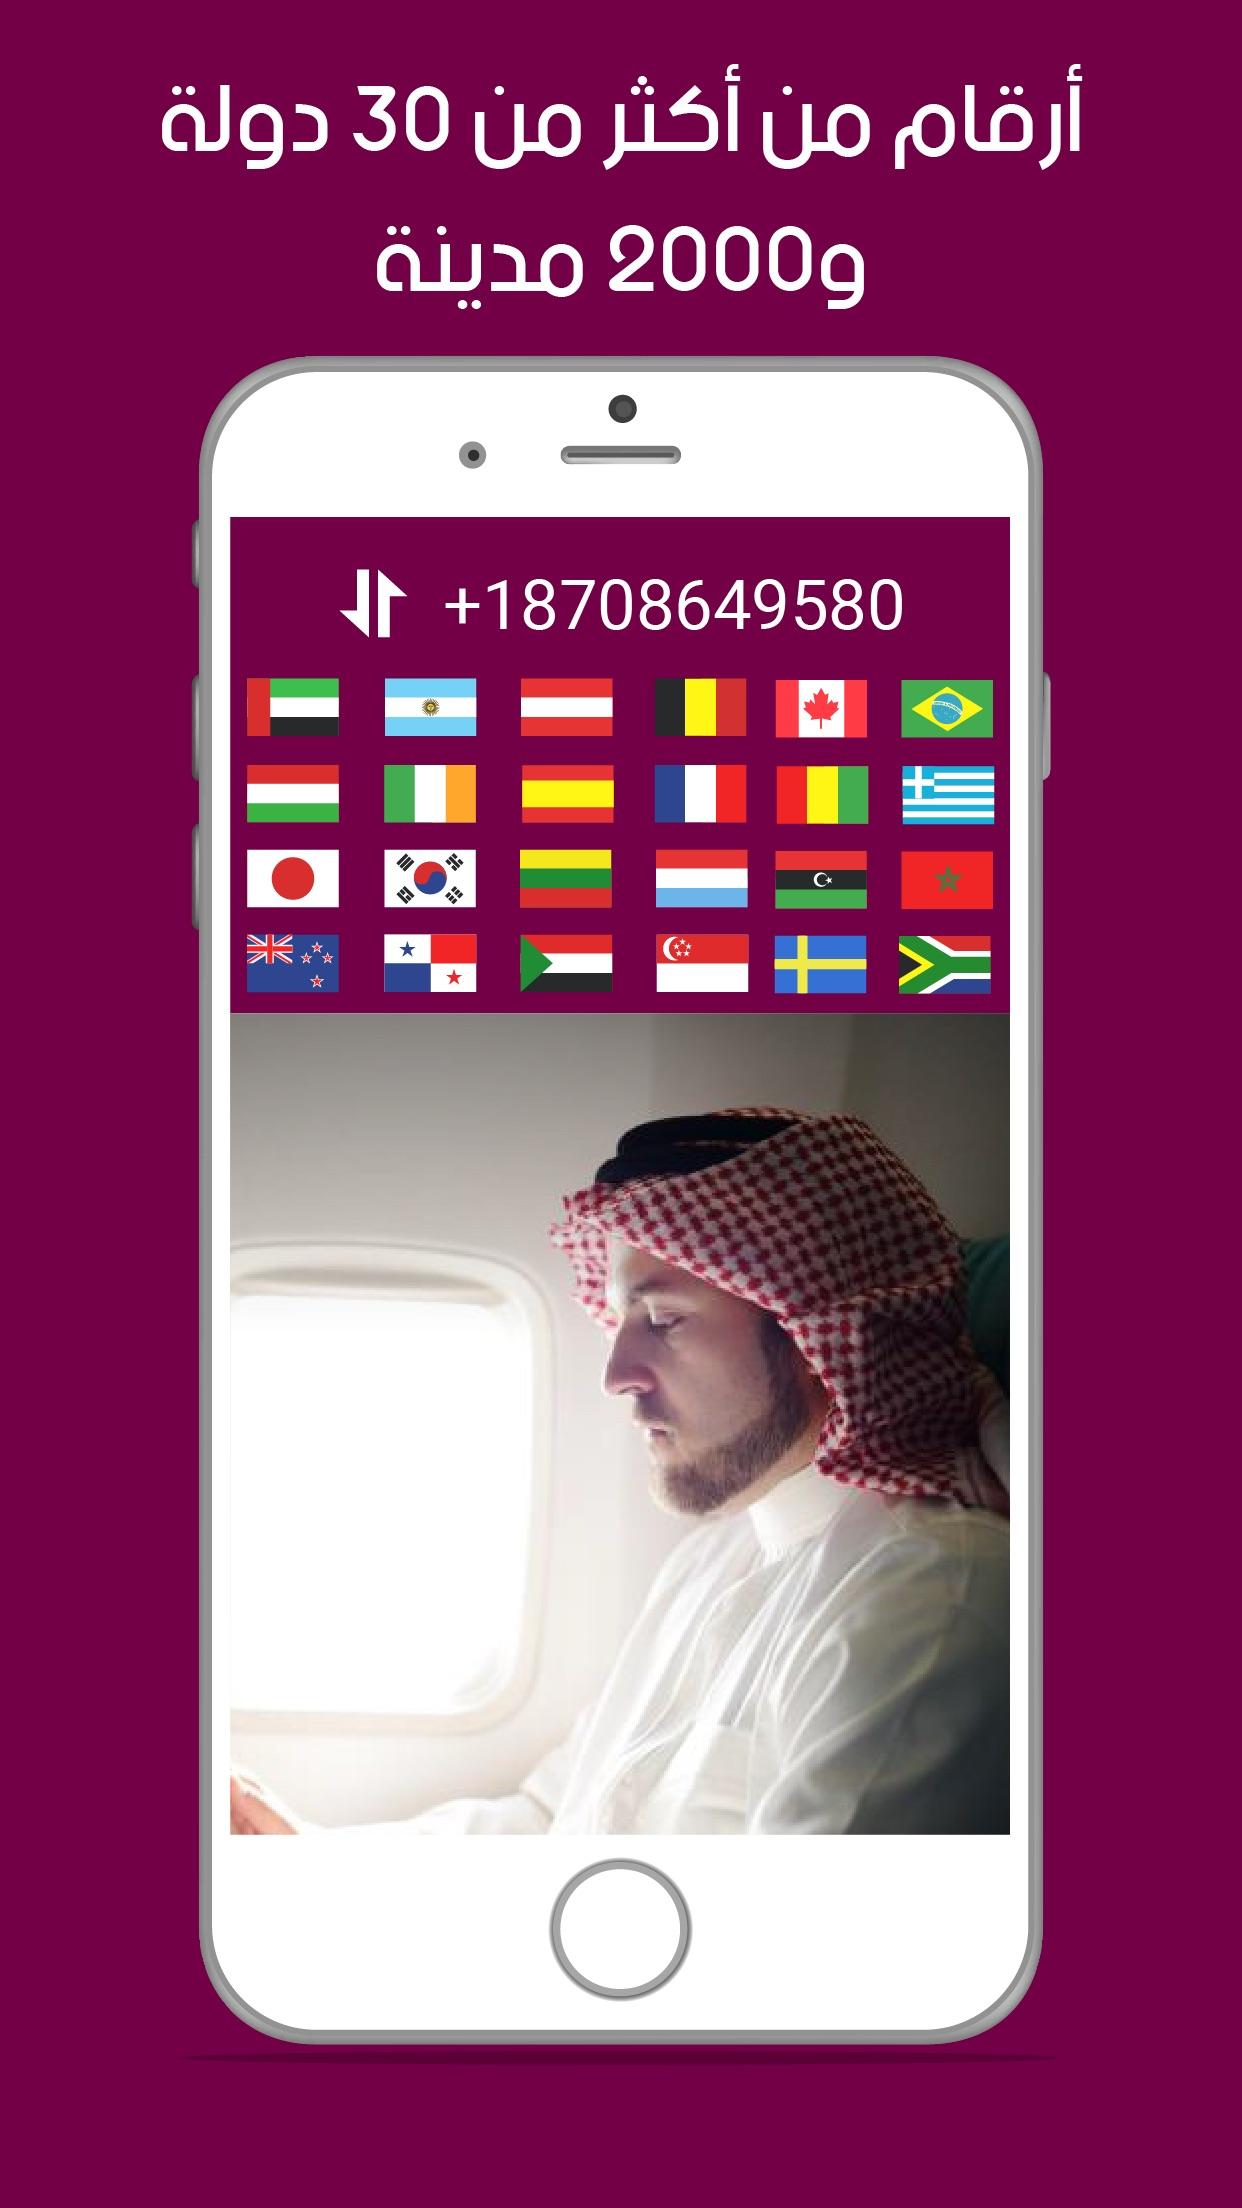 Numero eSIM ارقام دولية وهمية Screenshot